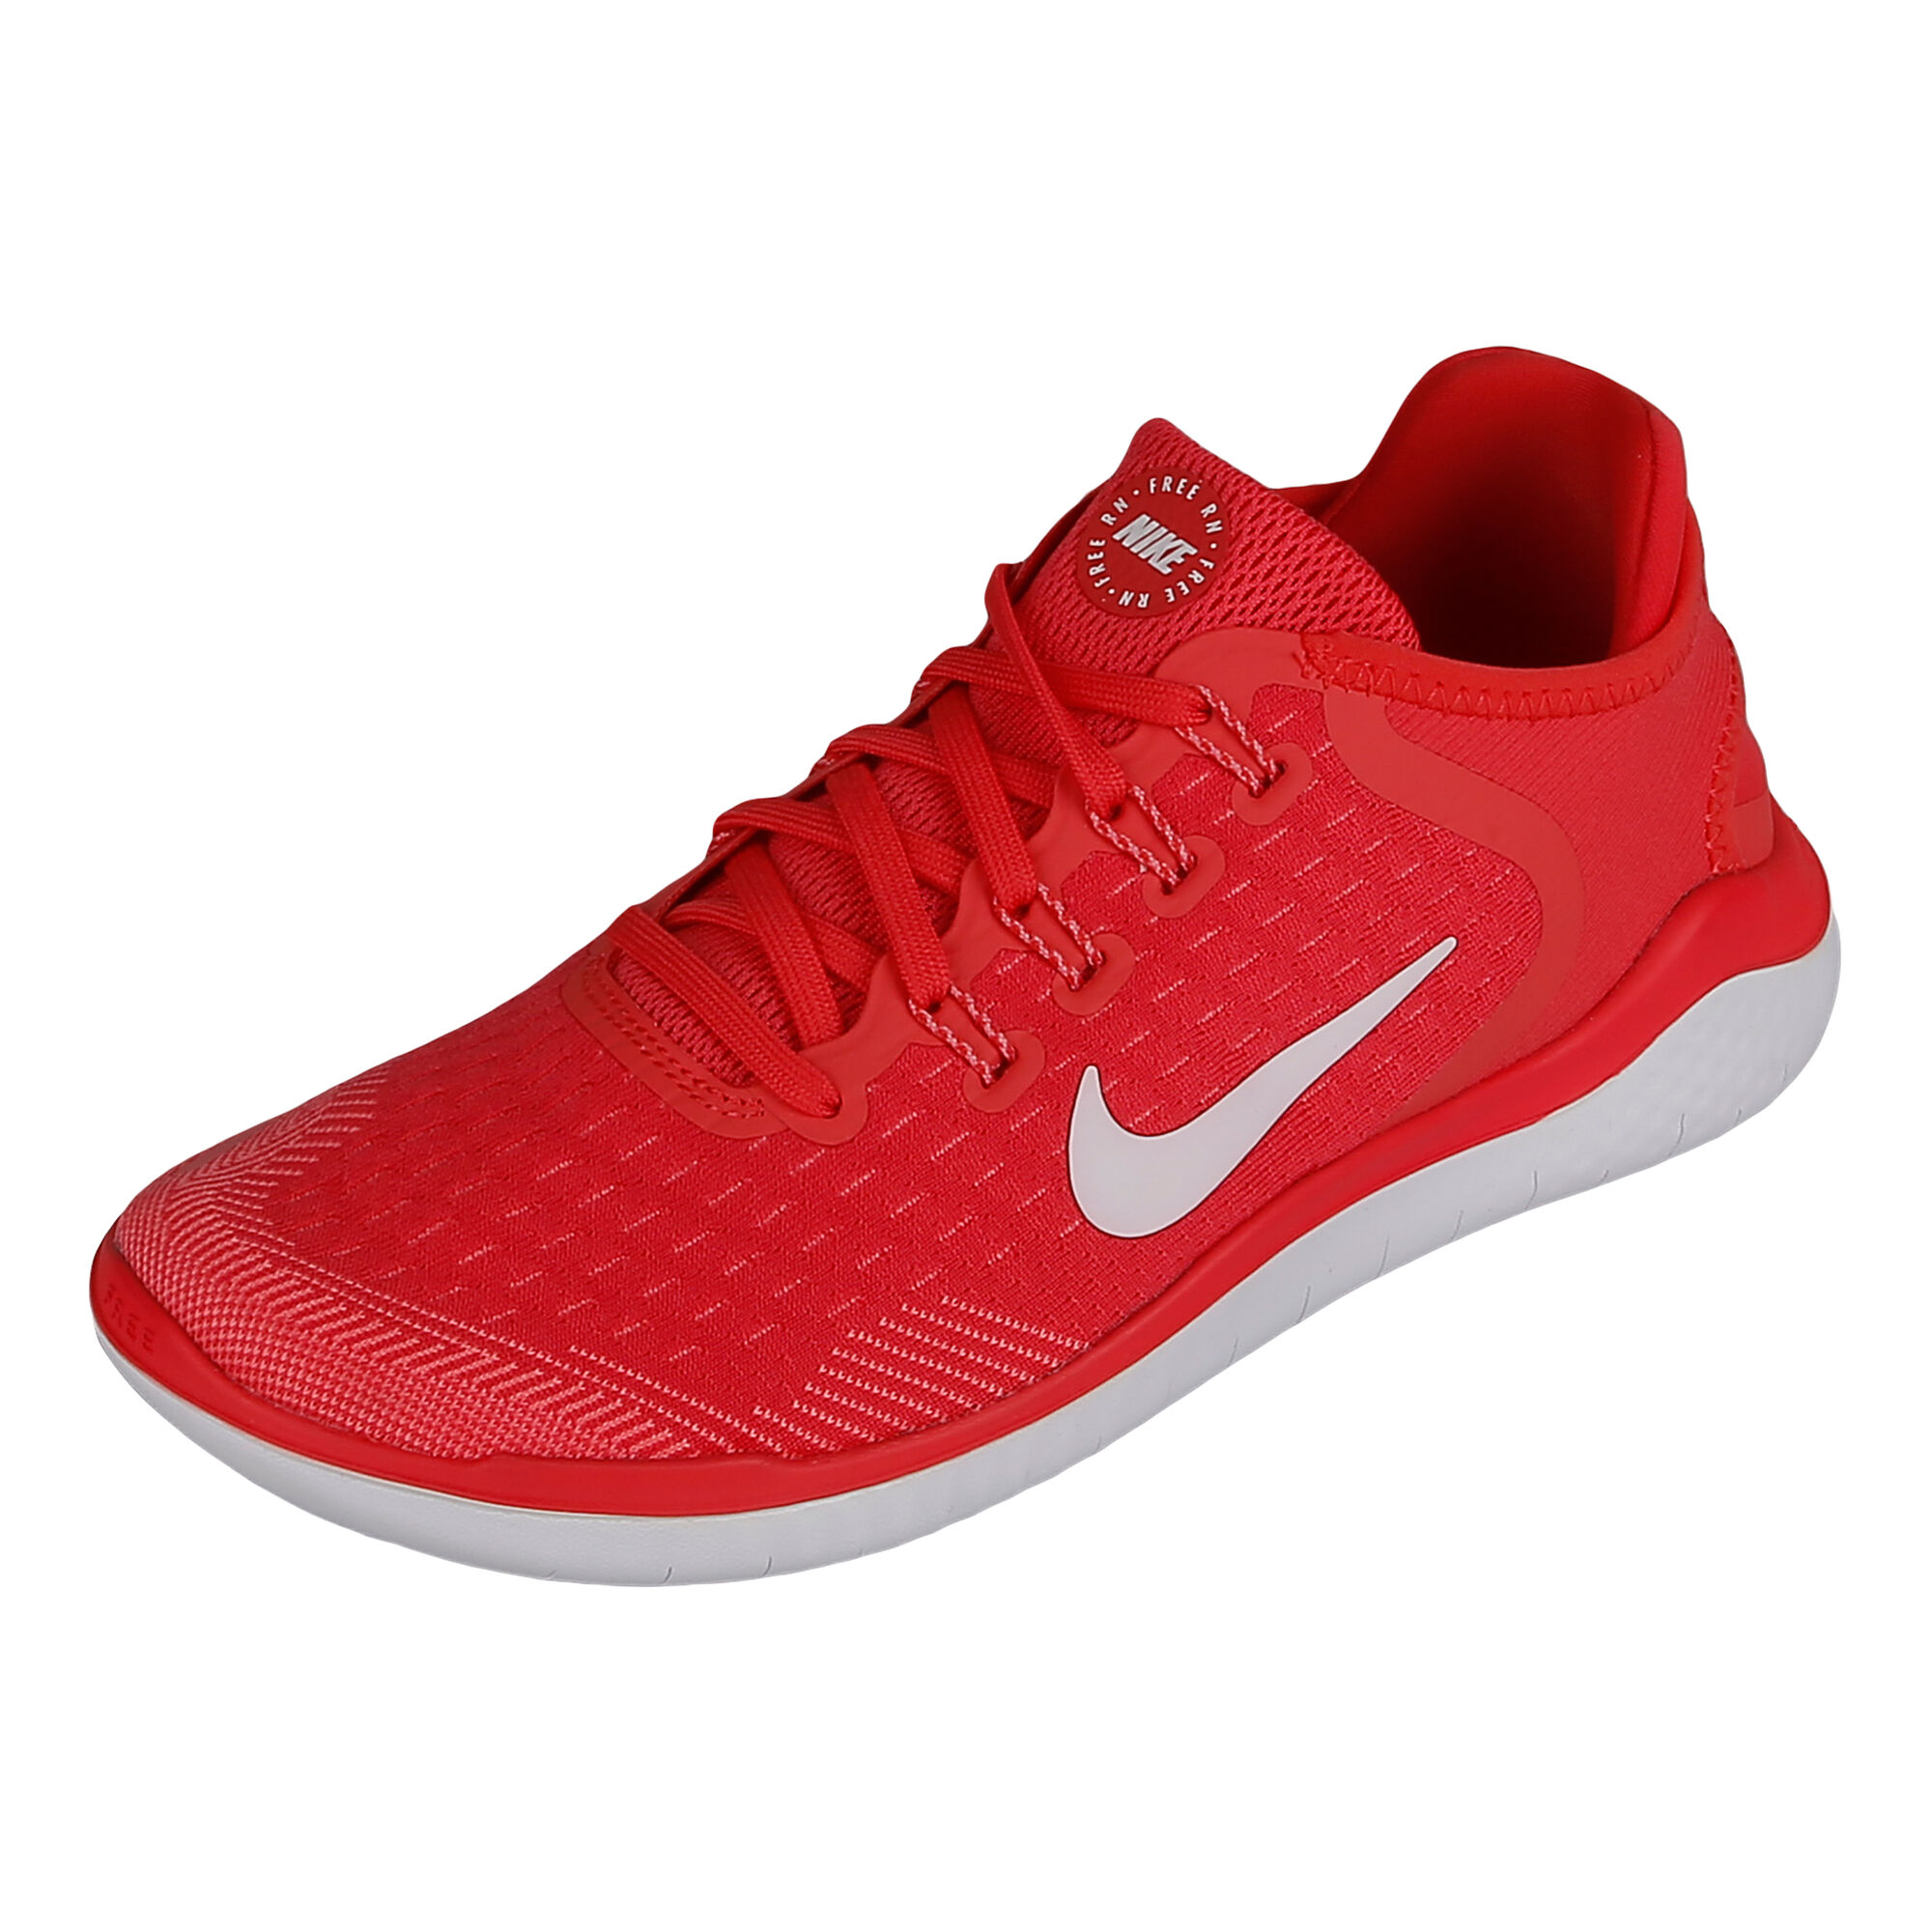 0e8013e9cff5 Nike  Nike  Nike  Nike  Nike  Nike  Nike  Nike  Nike  Nike. Free Run 2018  Women ...